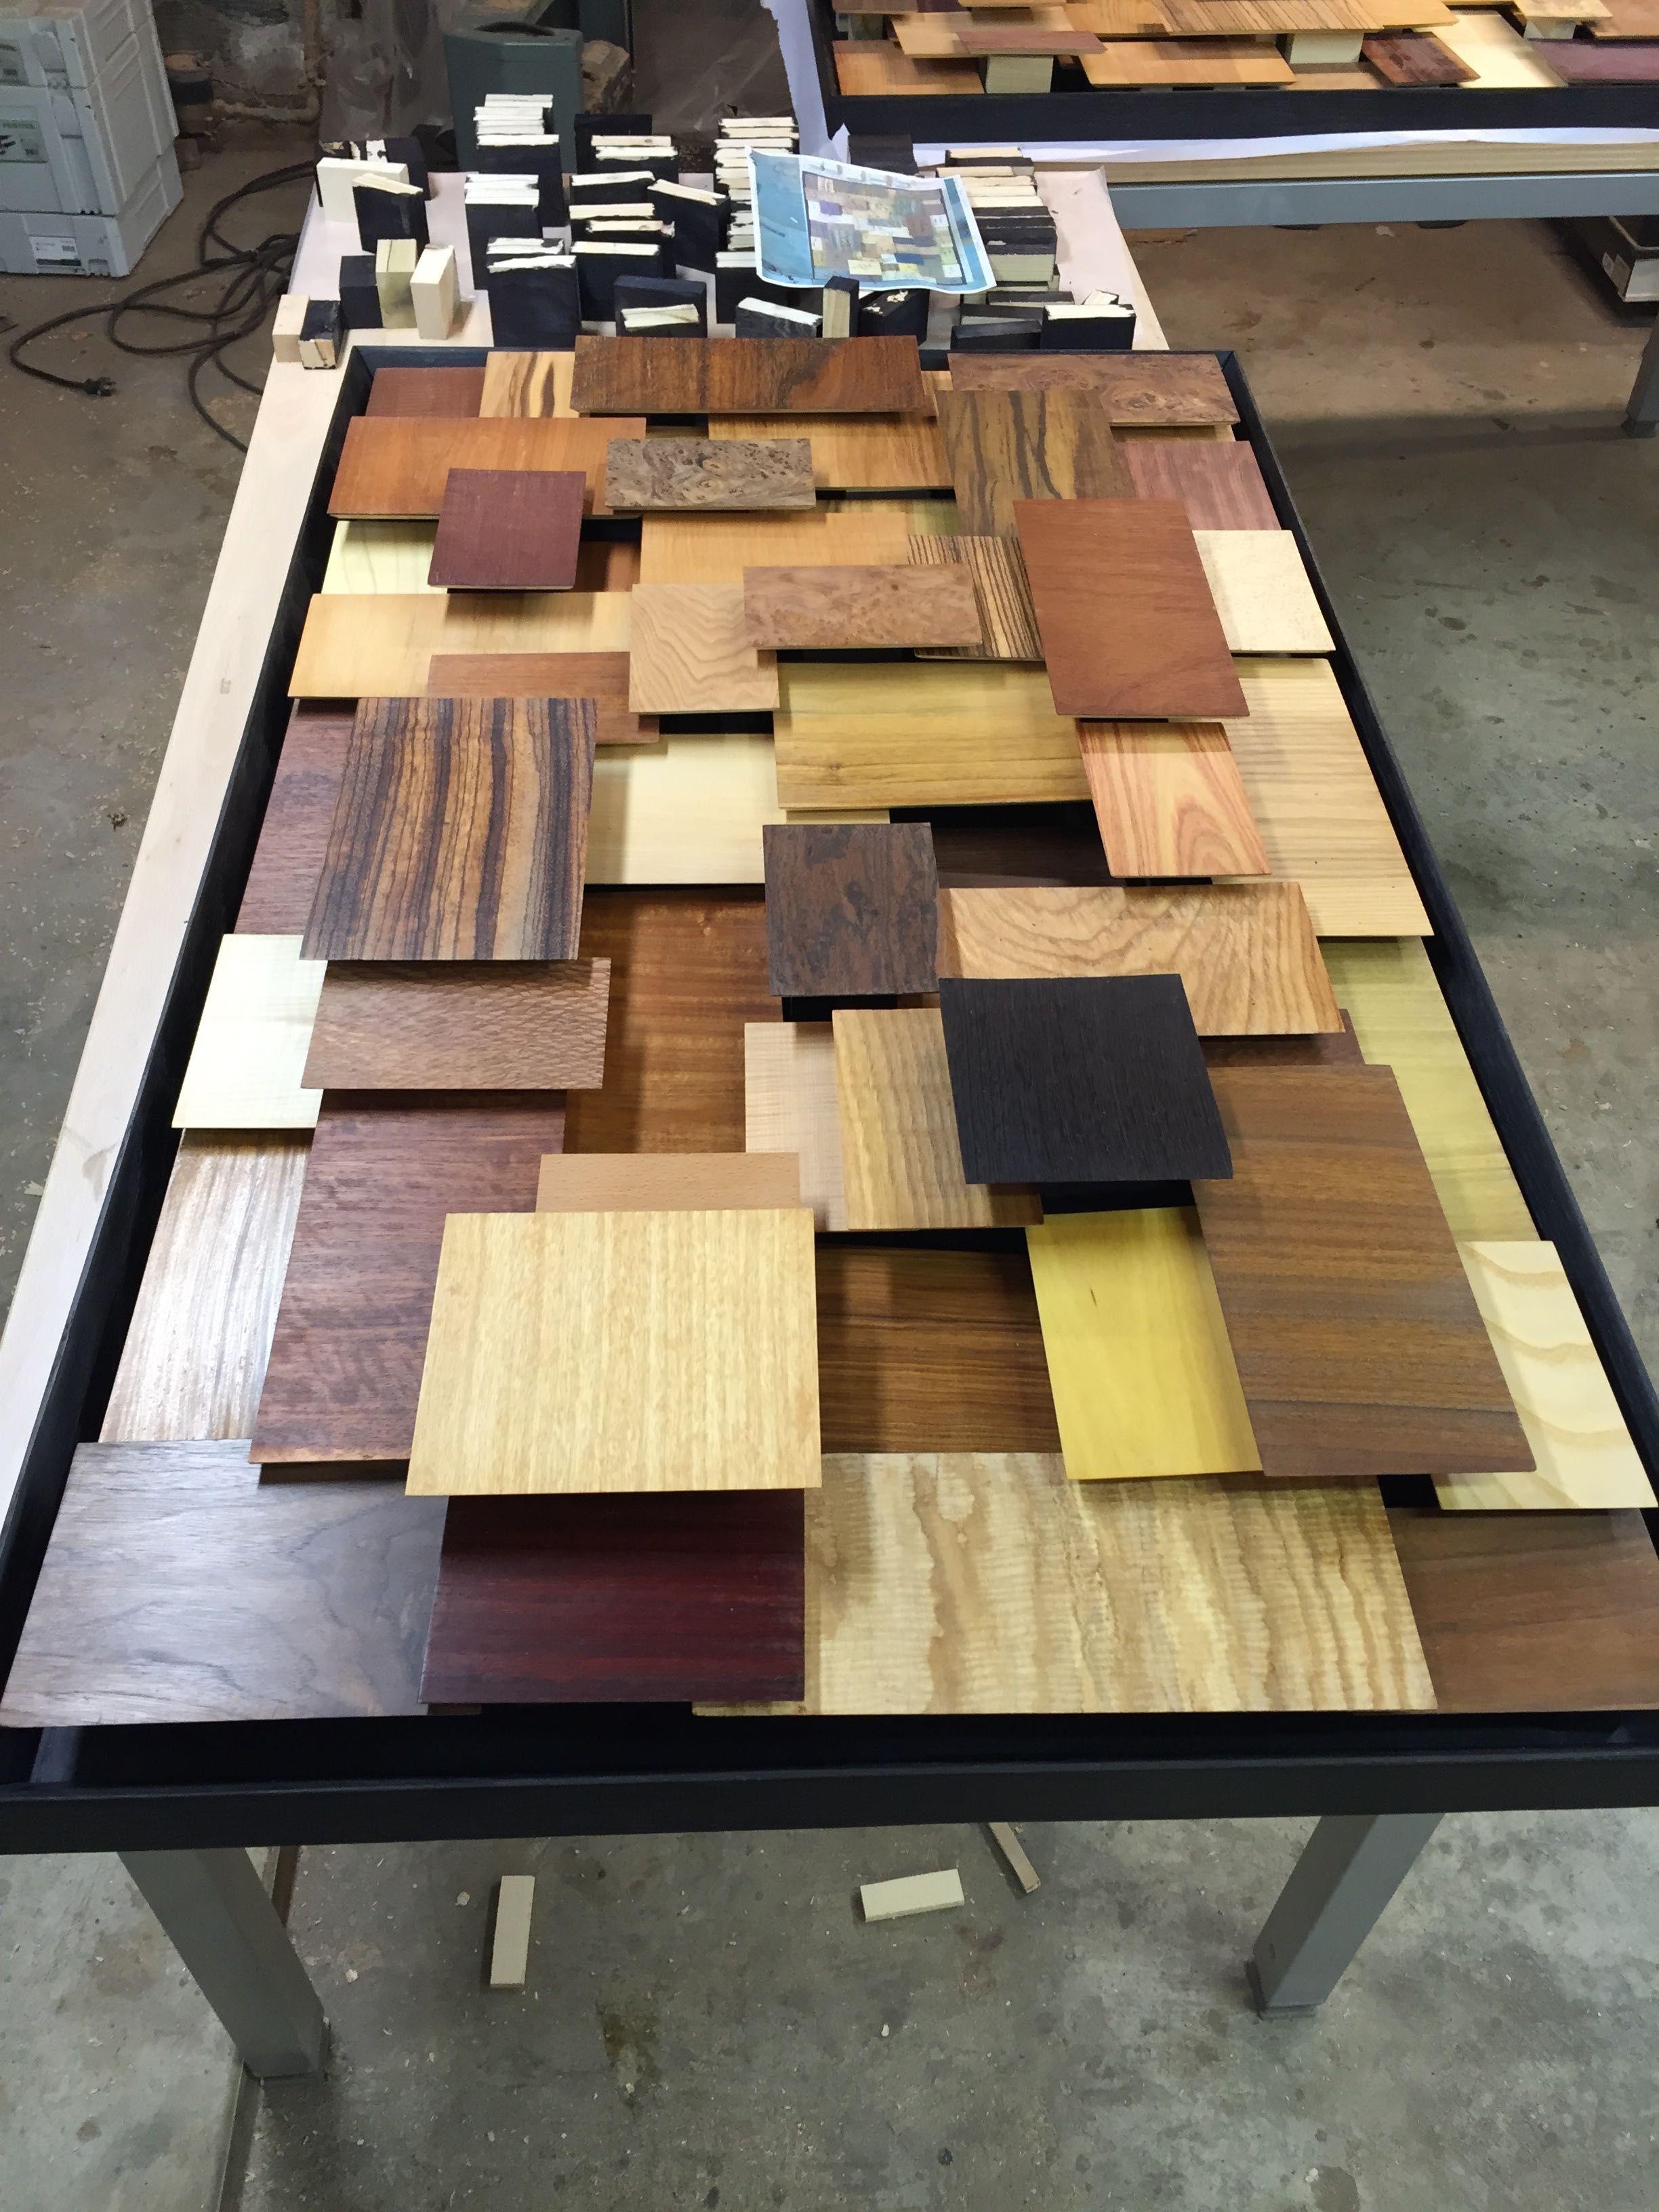 100 Trees A Display Of Wood Veneers Reader S Gallery Fine Woodworking Wood Wall Design Diy Decor Woodworking [ 3264 x 2448 Pixel ]